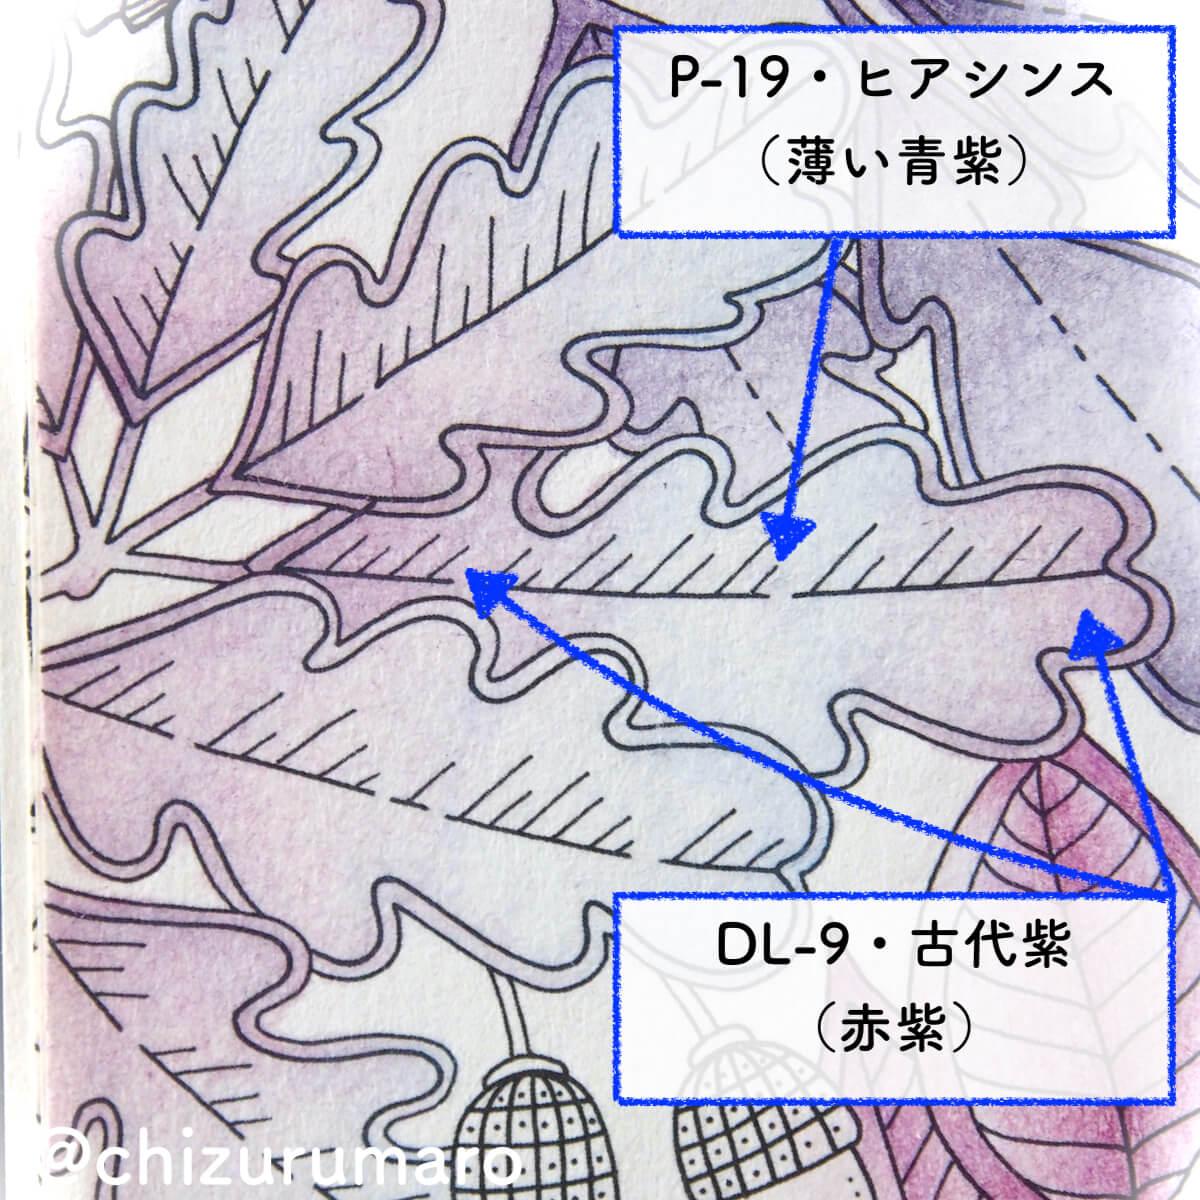 f:id:chizurumaro:20200513133801j:plain